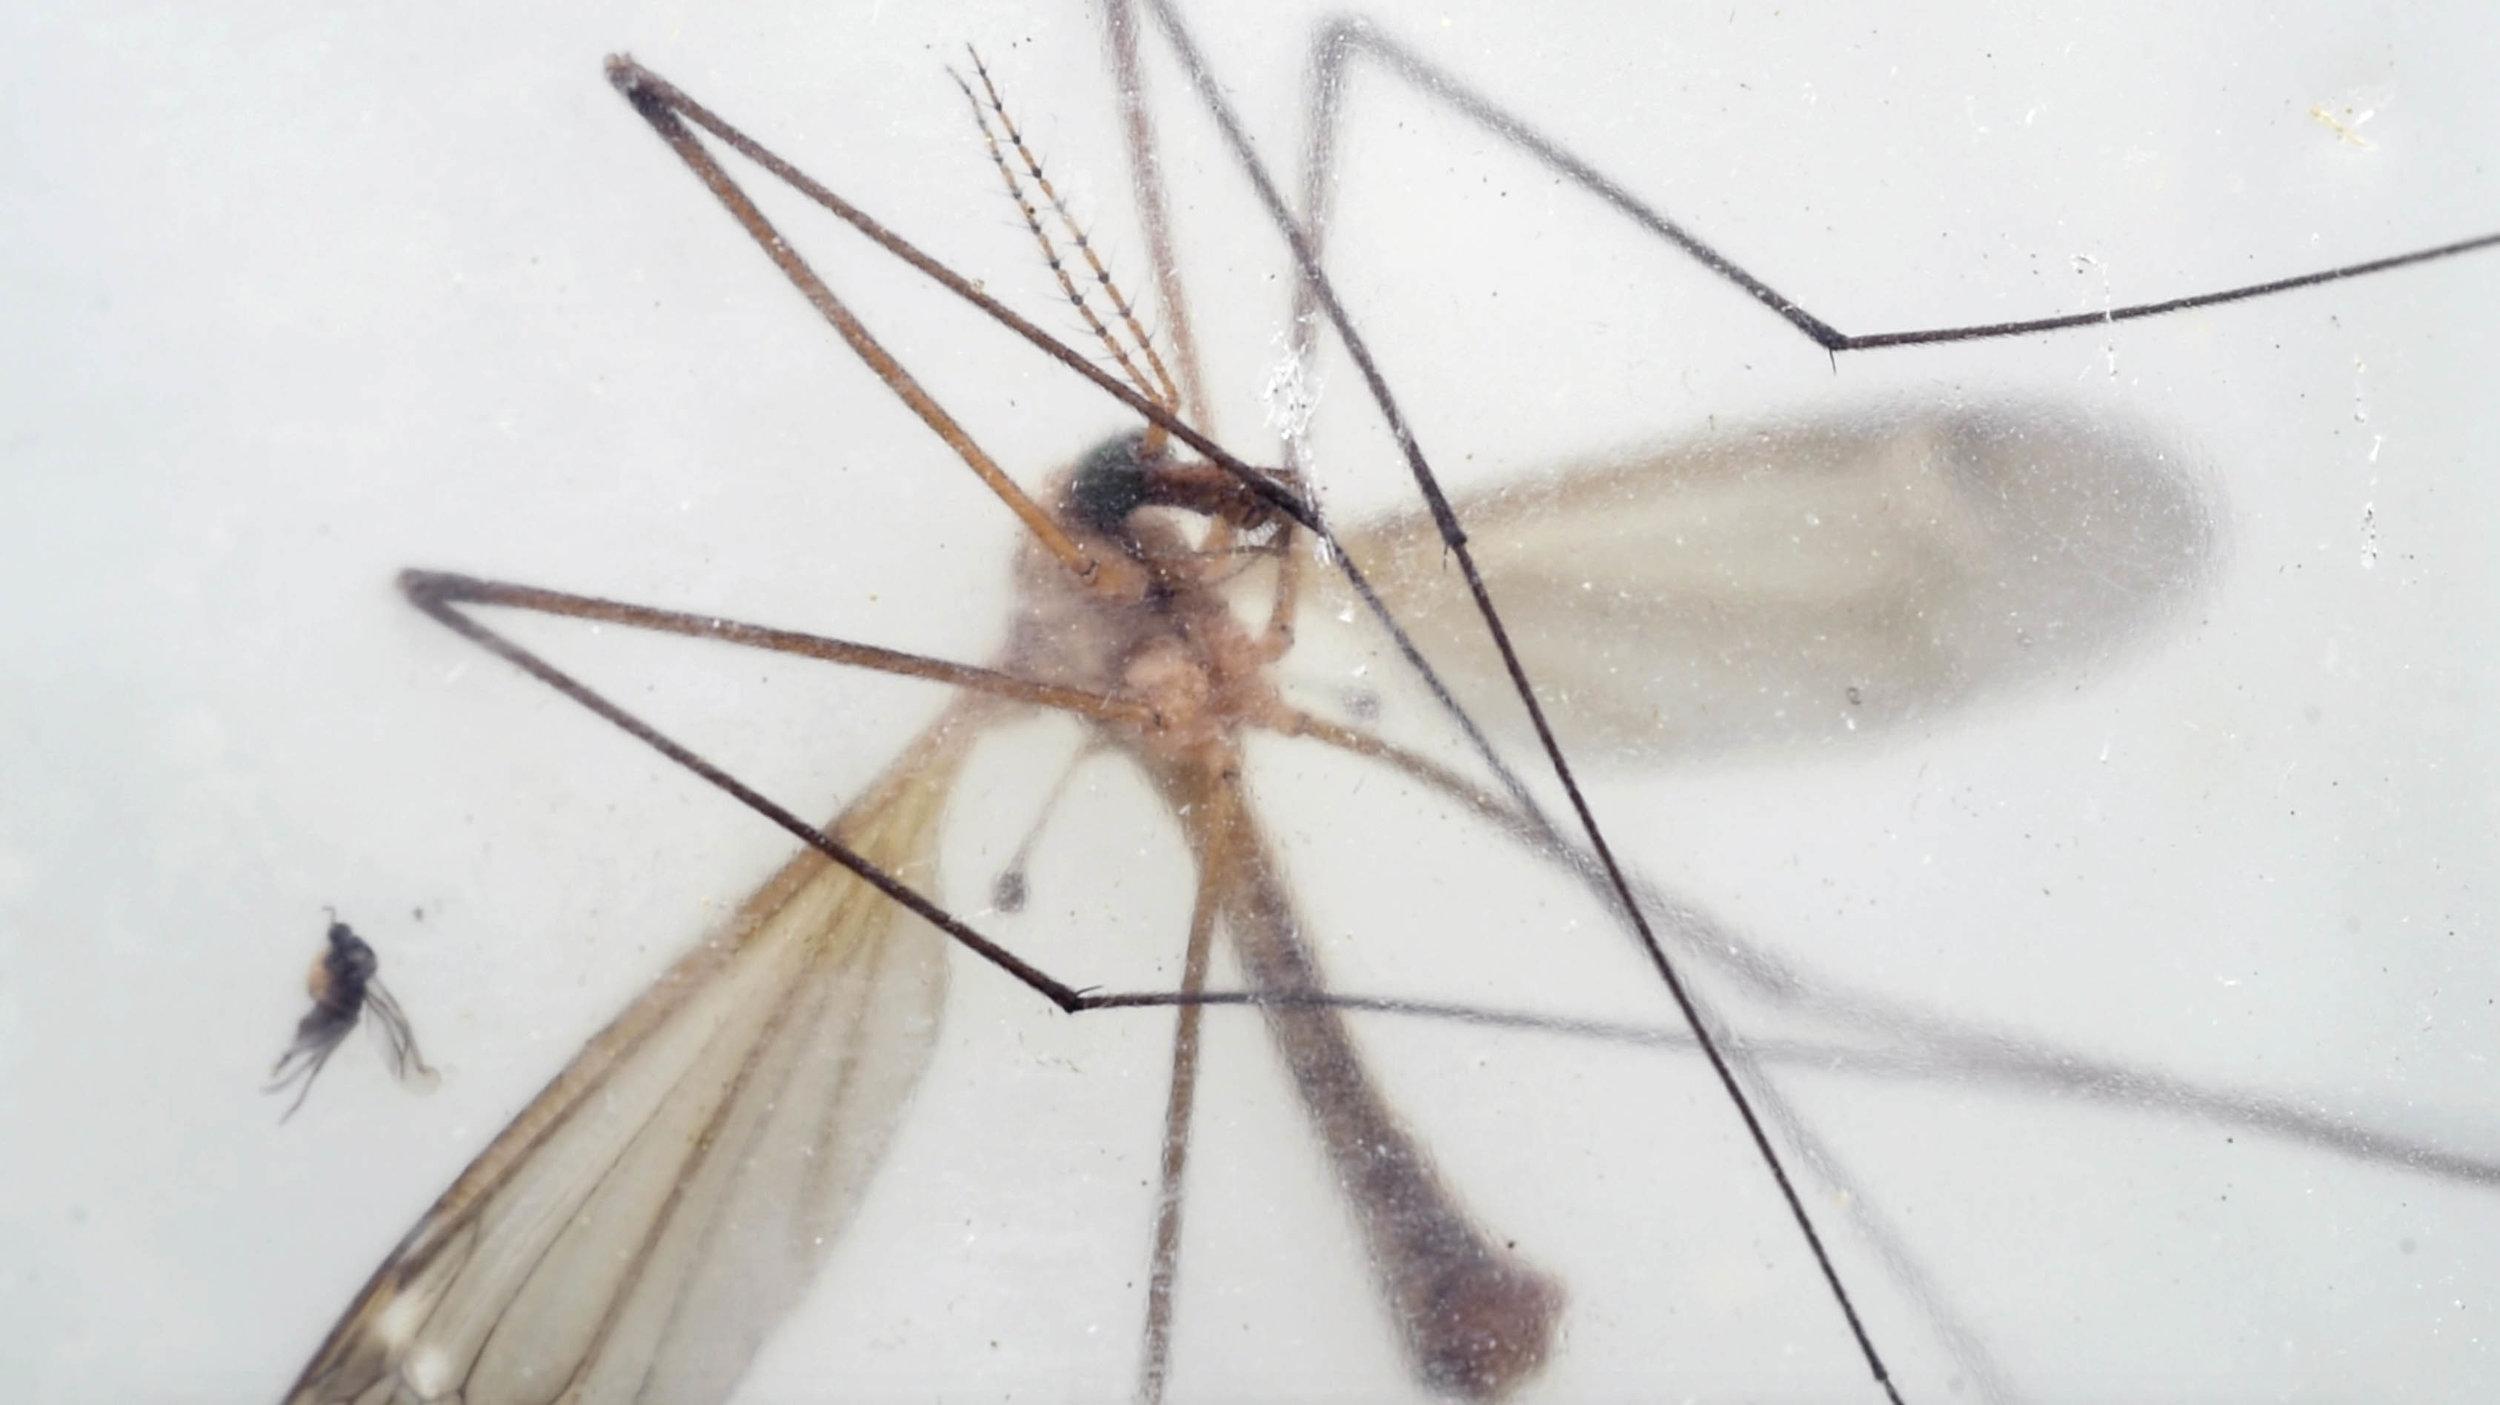 A Crane Fly, a bug eaten by the Little Brown Bat